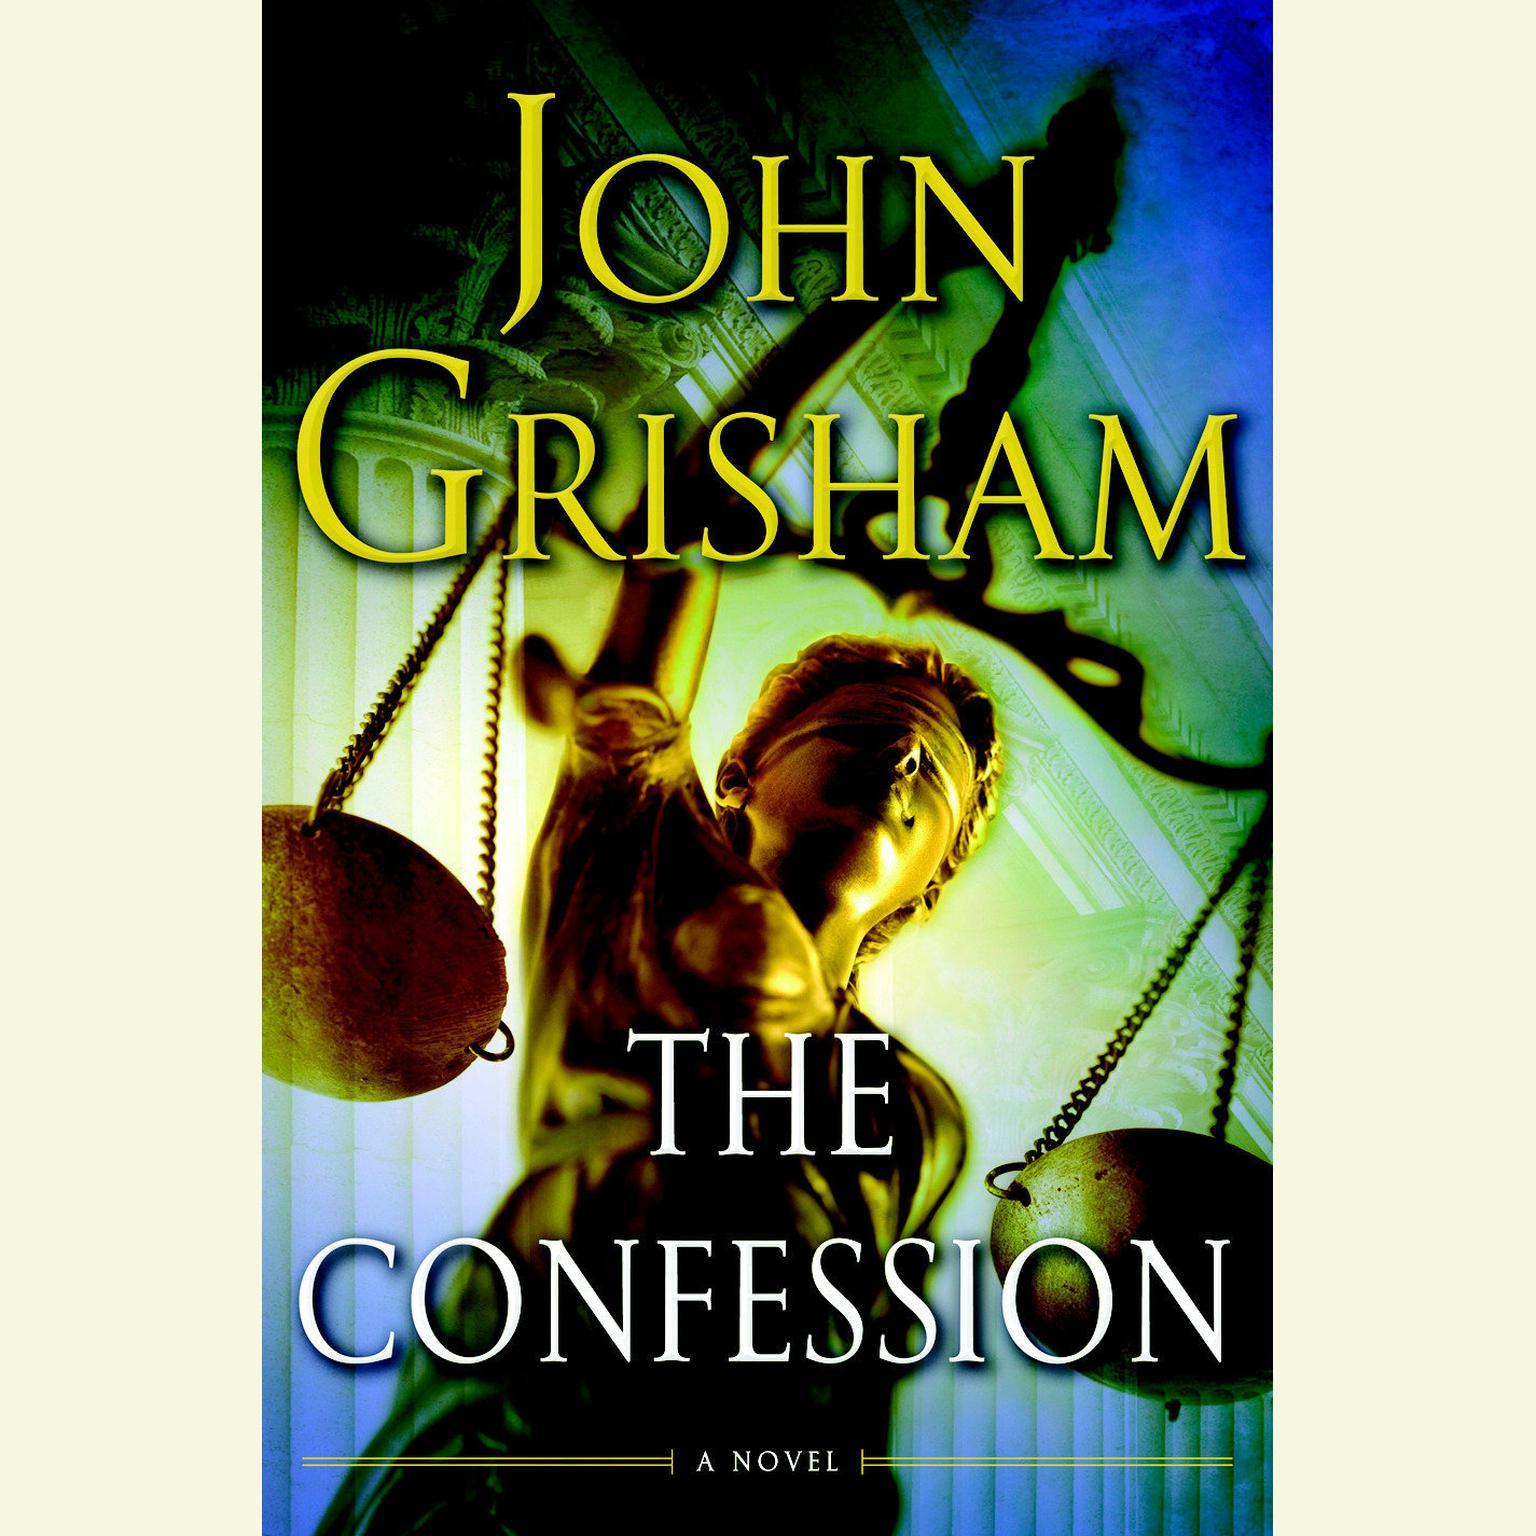 The Confession: A Novel Audiobook, by John Grisham